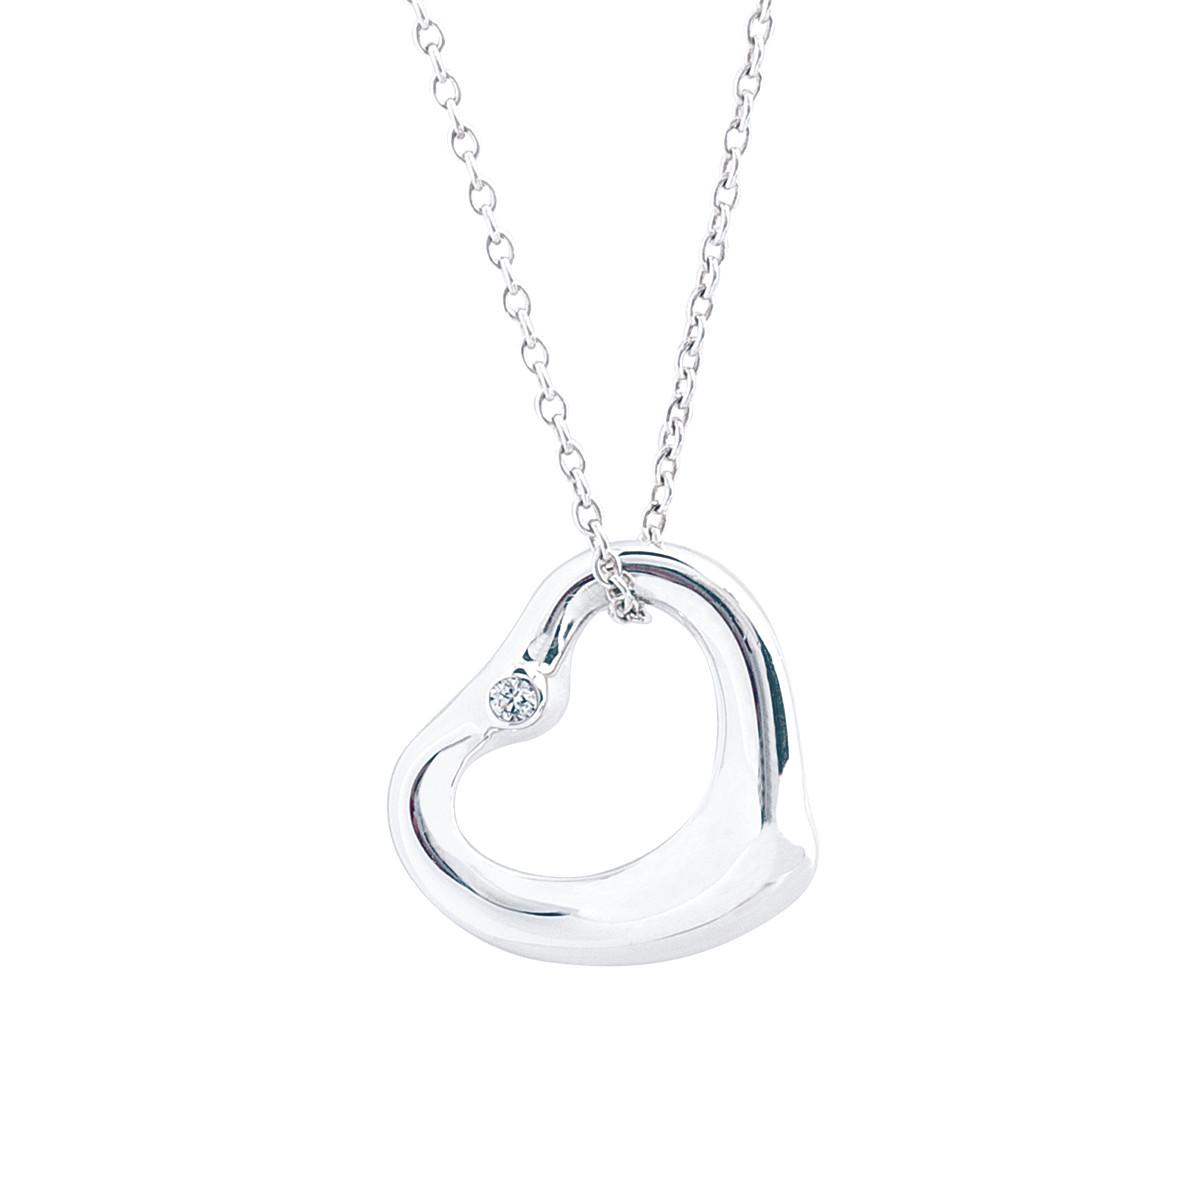 b0913e6ff5a77 Vintage Tiffany & Co. Elsa Peretti Open Heart Diamond Pendant